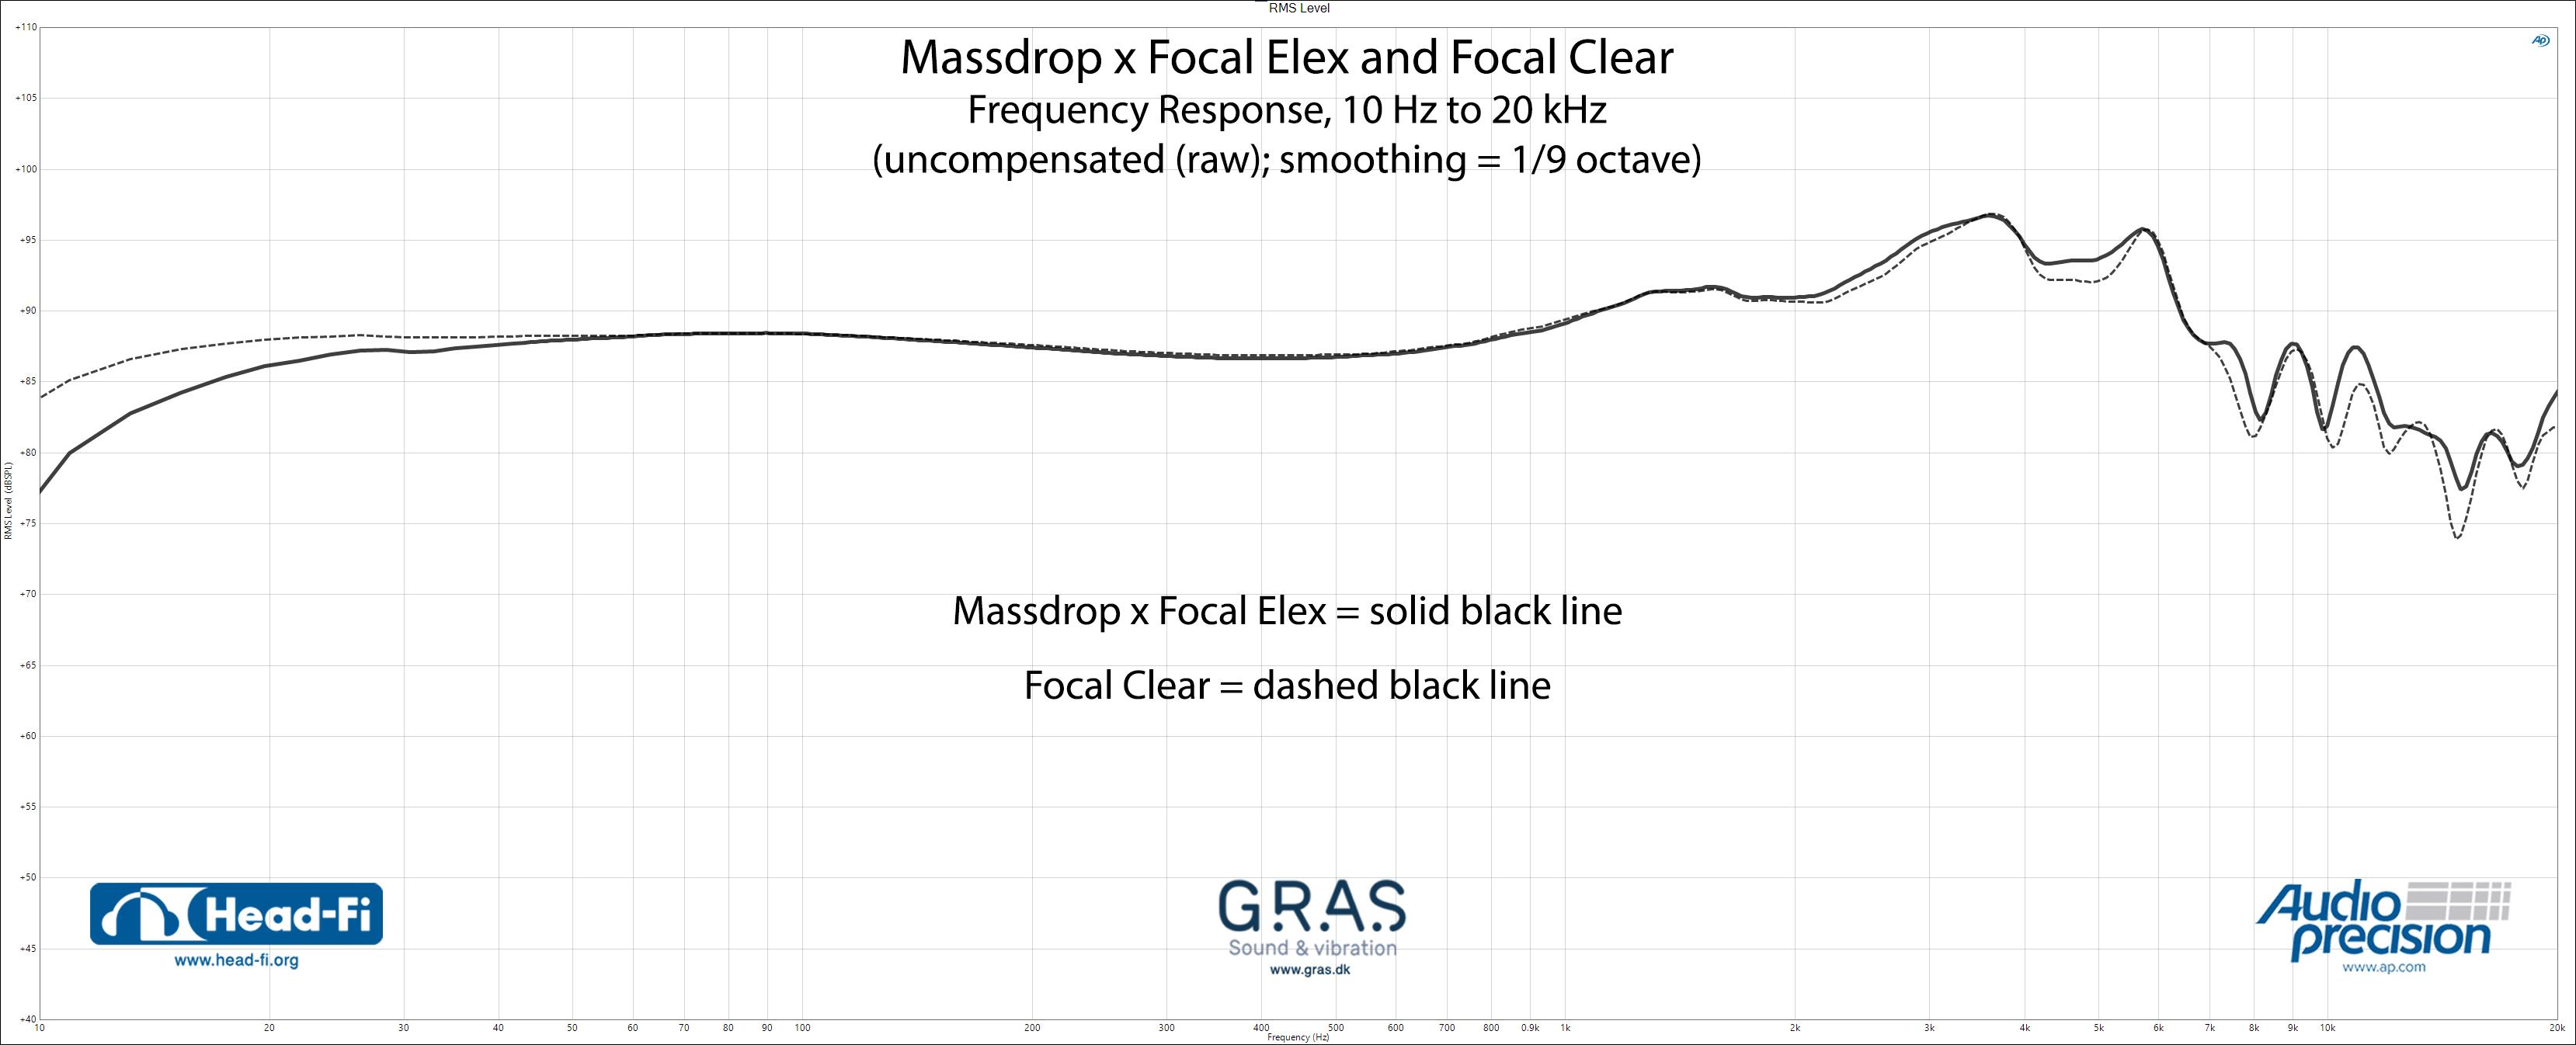 RMS-Level_1-9_RAW_Massdrop-x-Focal-Elex_Focal-Clear_10-Hz-to-20-kHz.jpg